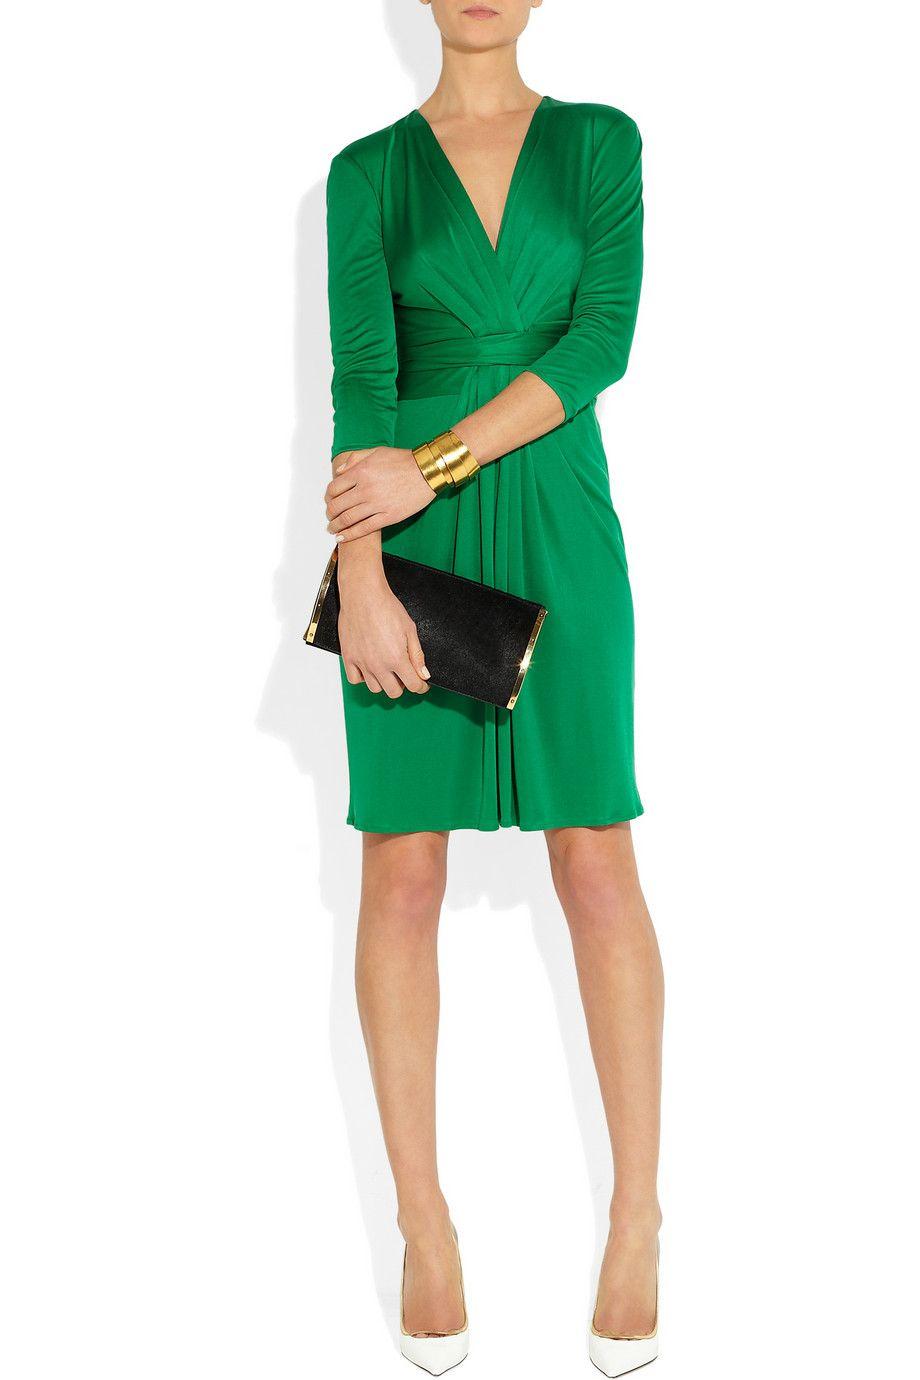 Issa | Ruched emerald silk-jersey dress | a girl can dream ...